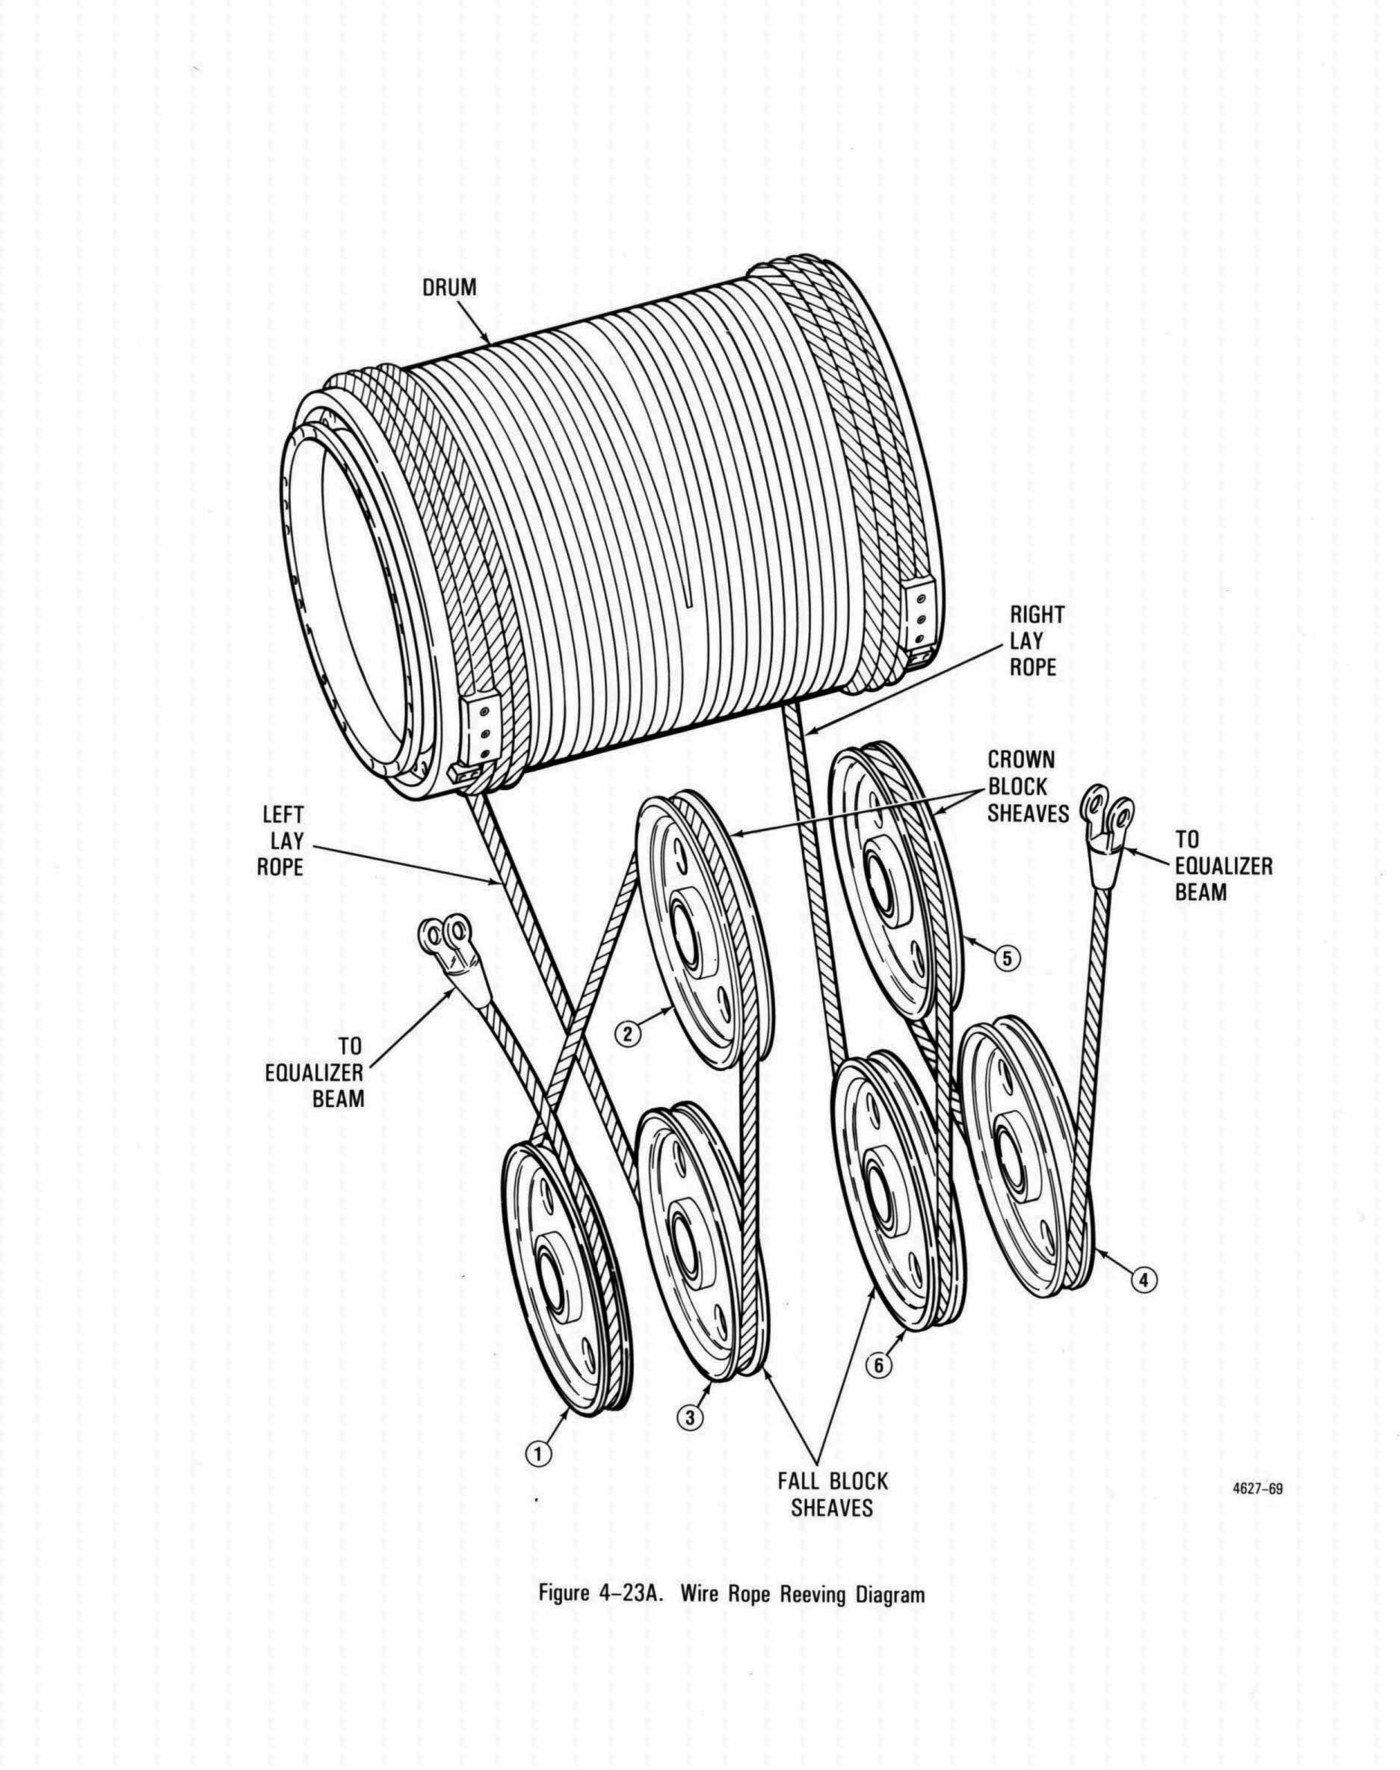 Wire Rope Hoist Dolgularcom Q-see Qsds14273w Wire Diagram Model